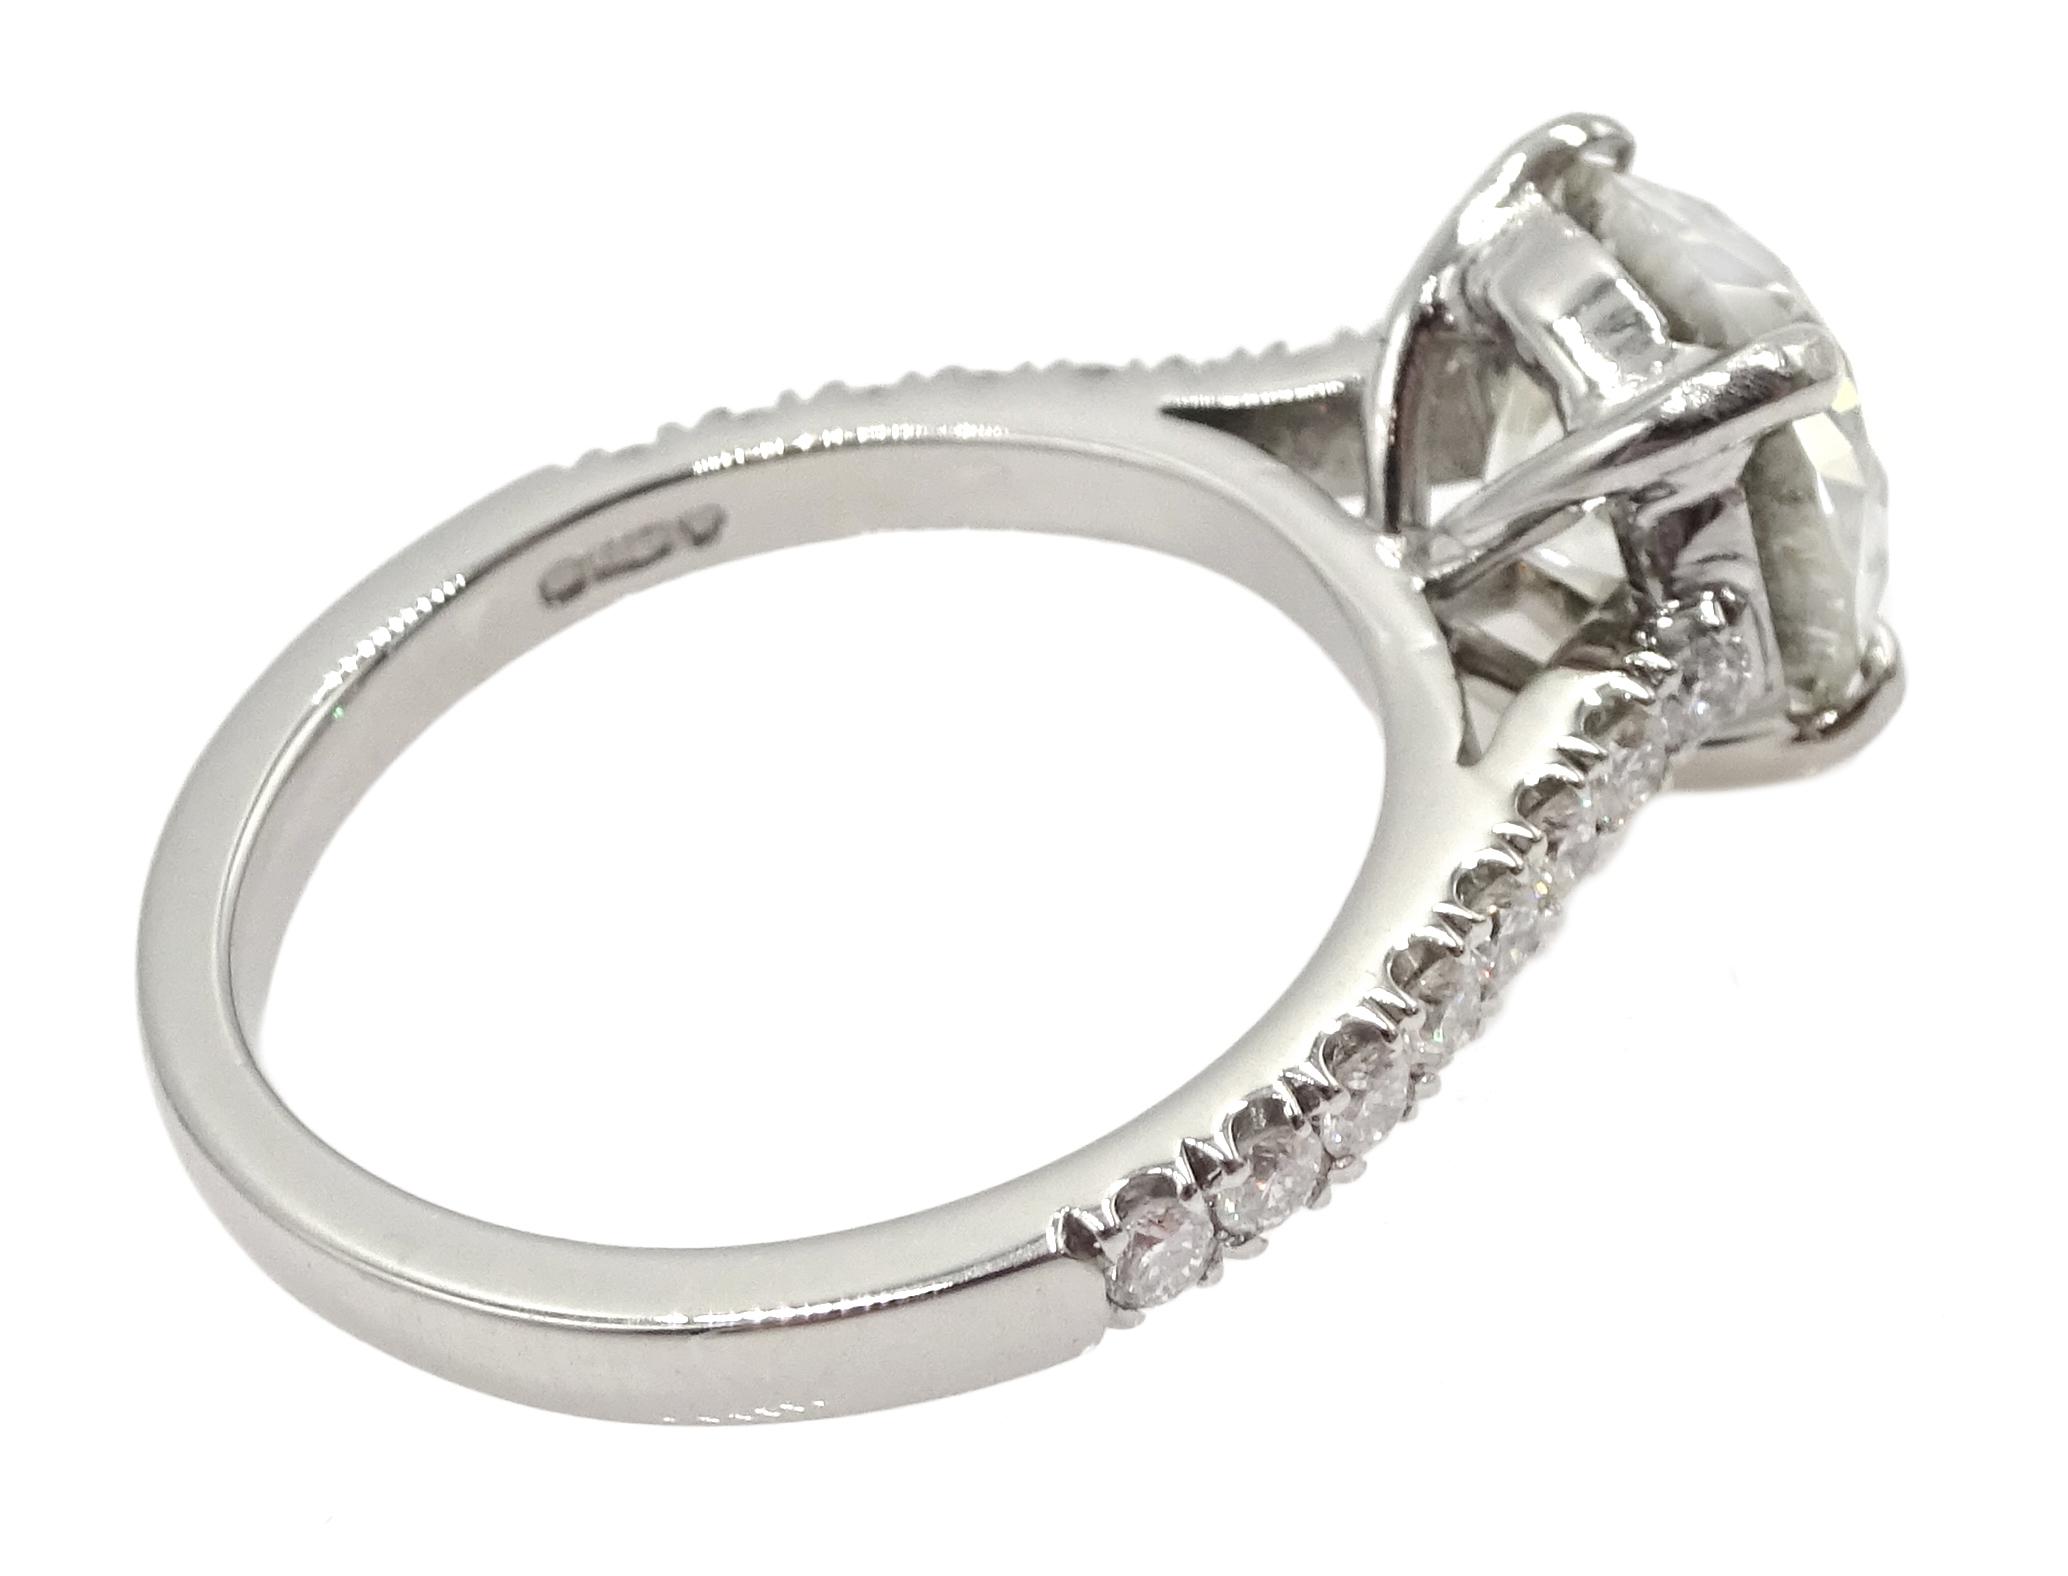 Platinum old cut diamond solitaire ring - Image 6 of 9